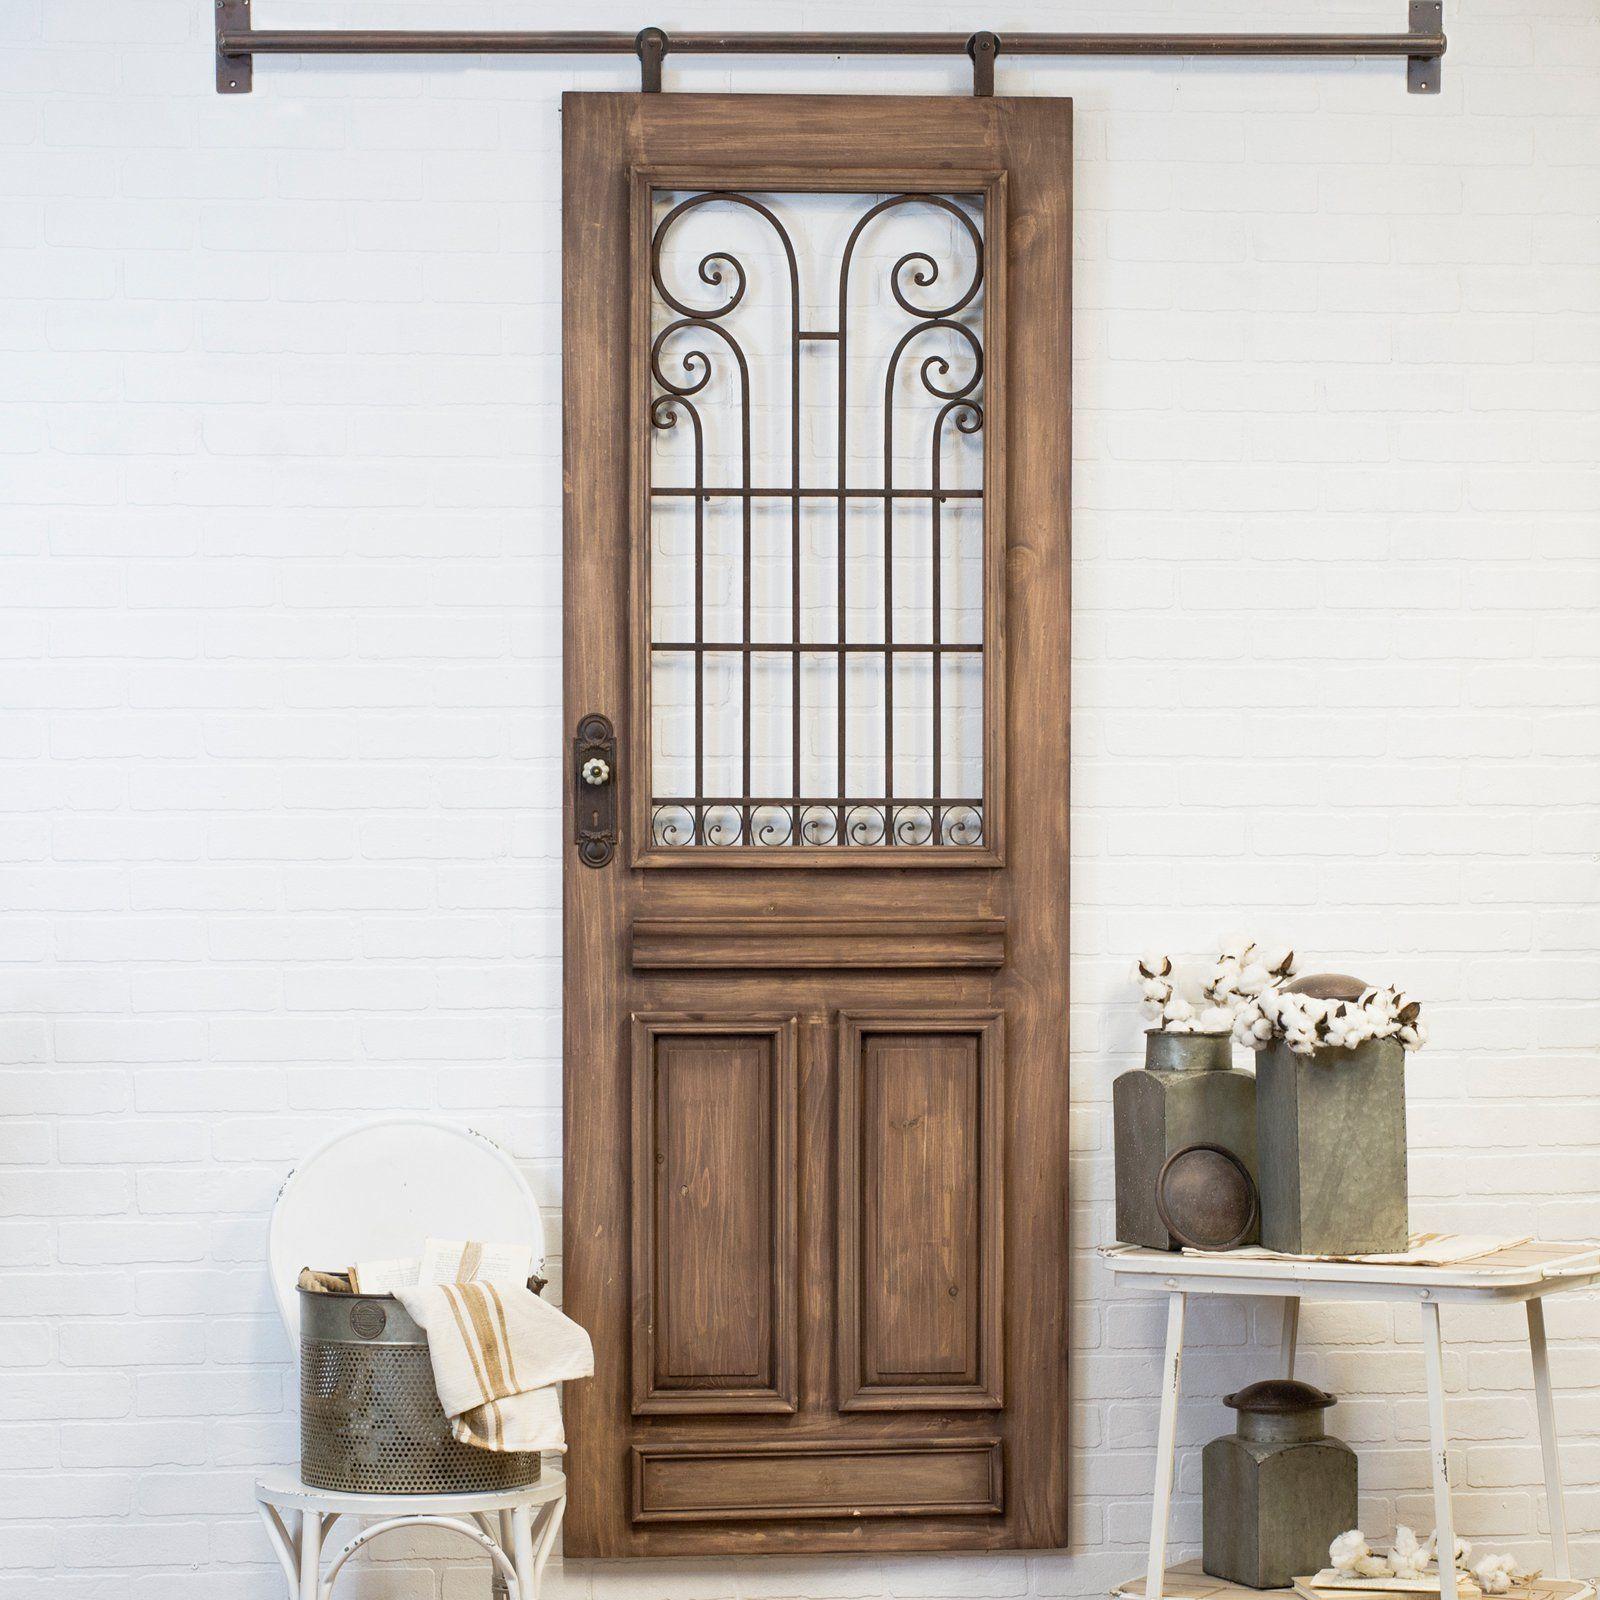 Accent Wall Behind Barn Doors: American Mercantile Wood Hanging Door Wall Accent In 2019